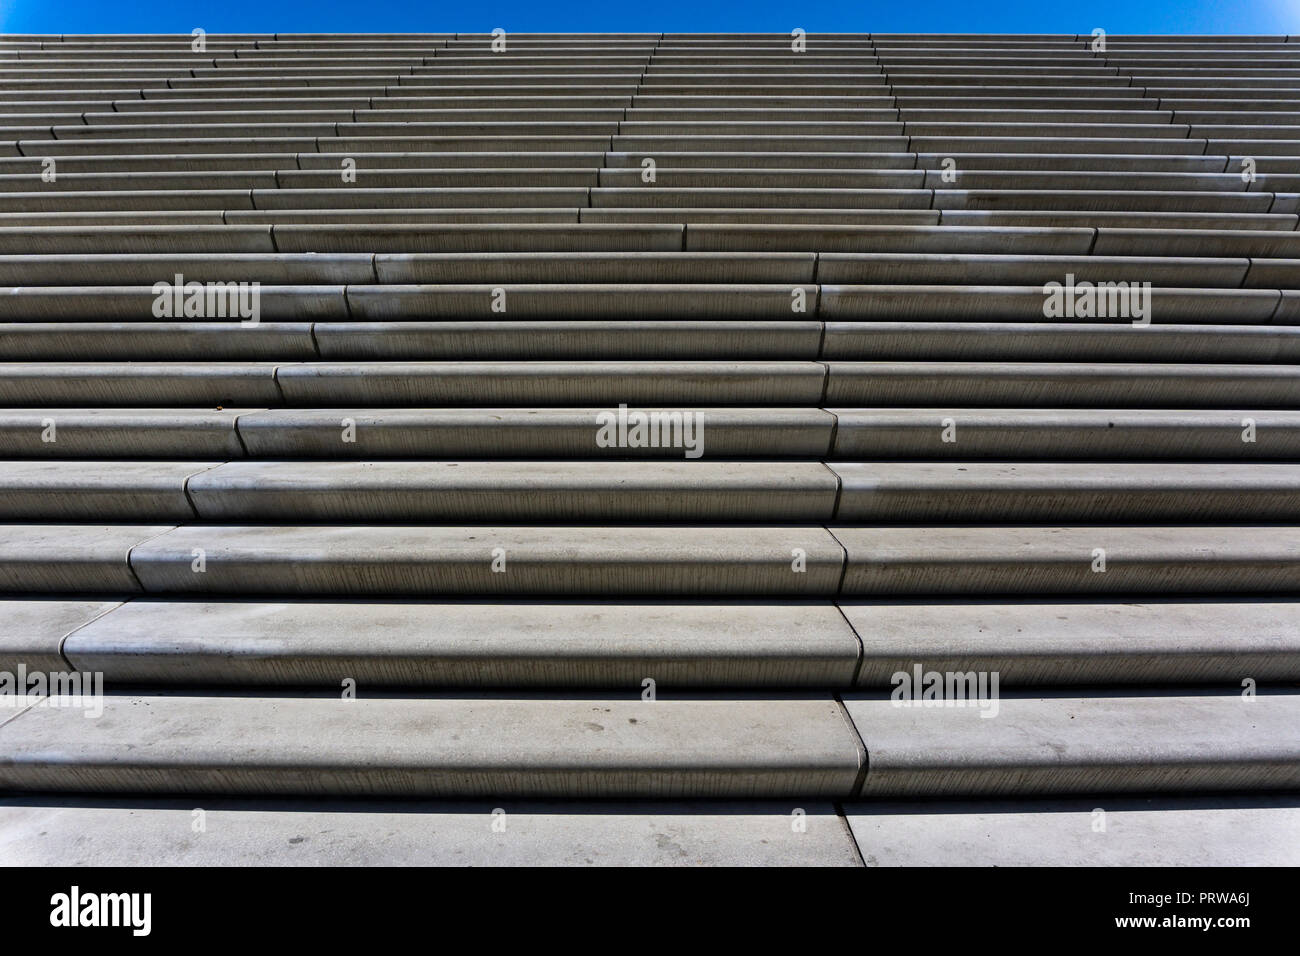 Hamburg , Germany, June 26, 2018: Full Frame Close-Up of Stairs at Landungsbrücken  Against Blue Sky - Stock Image